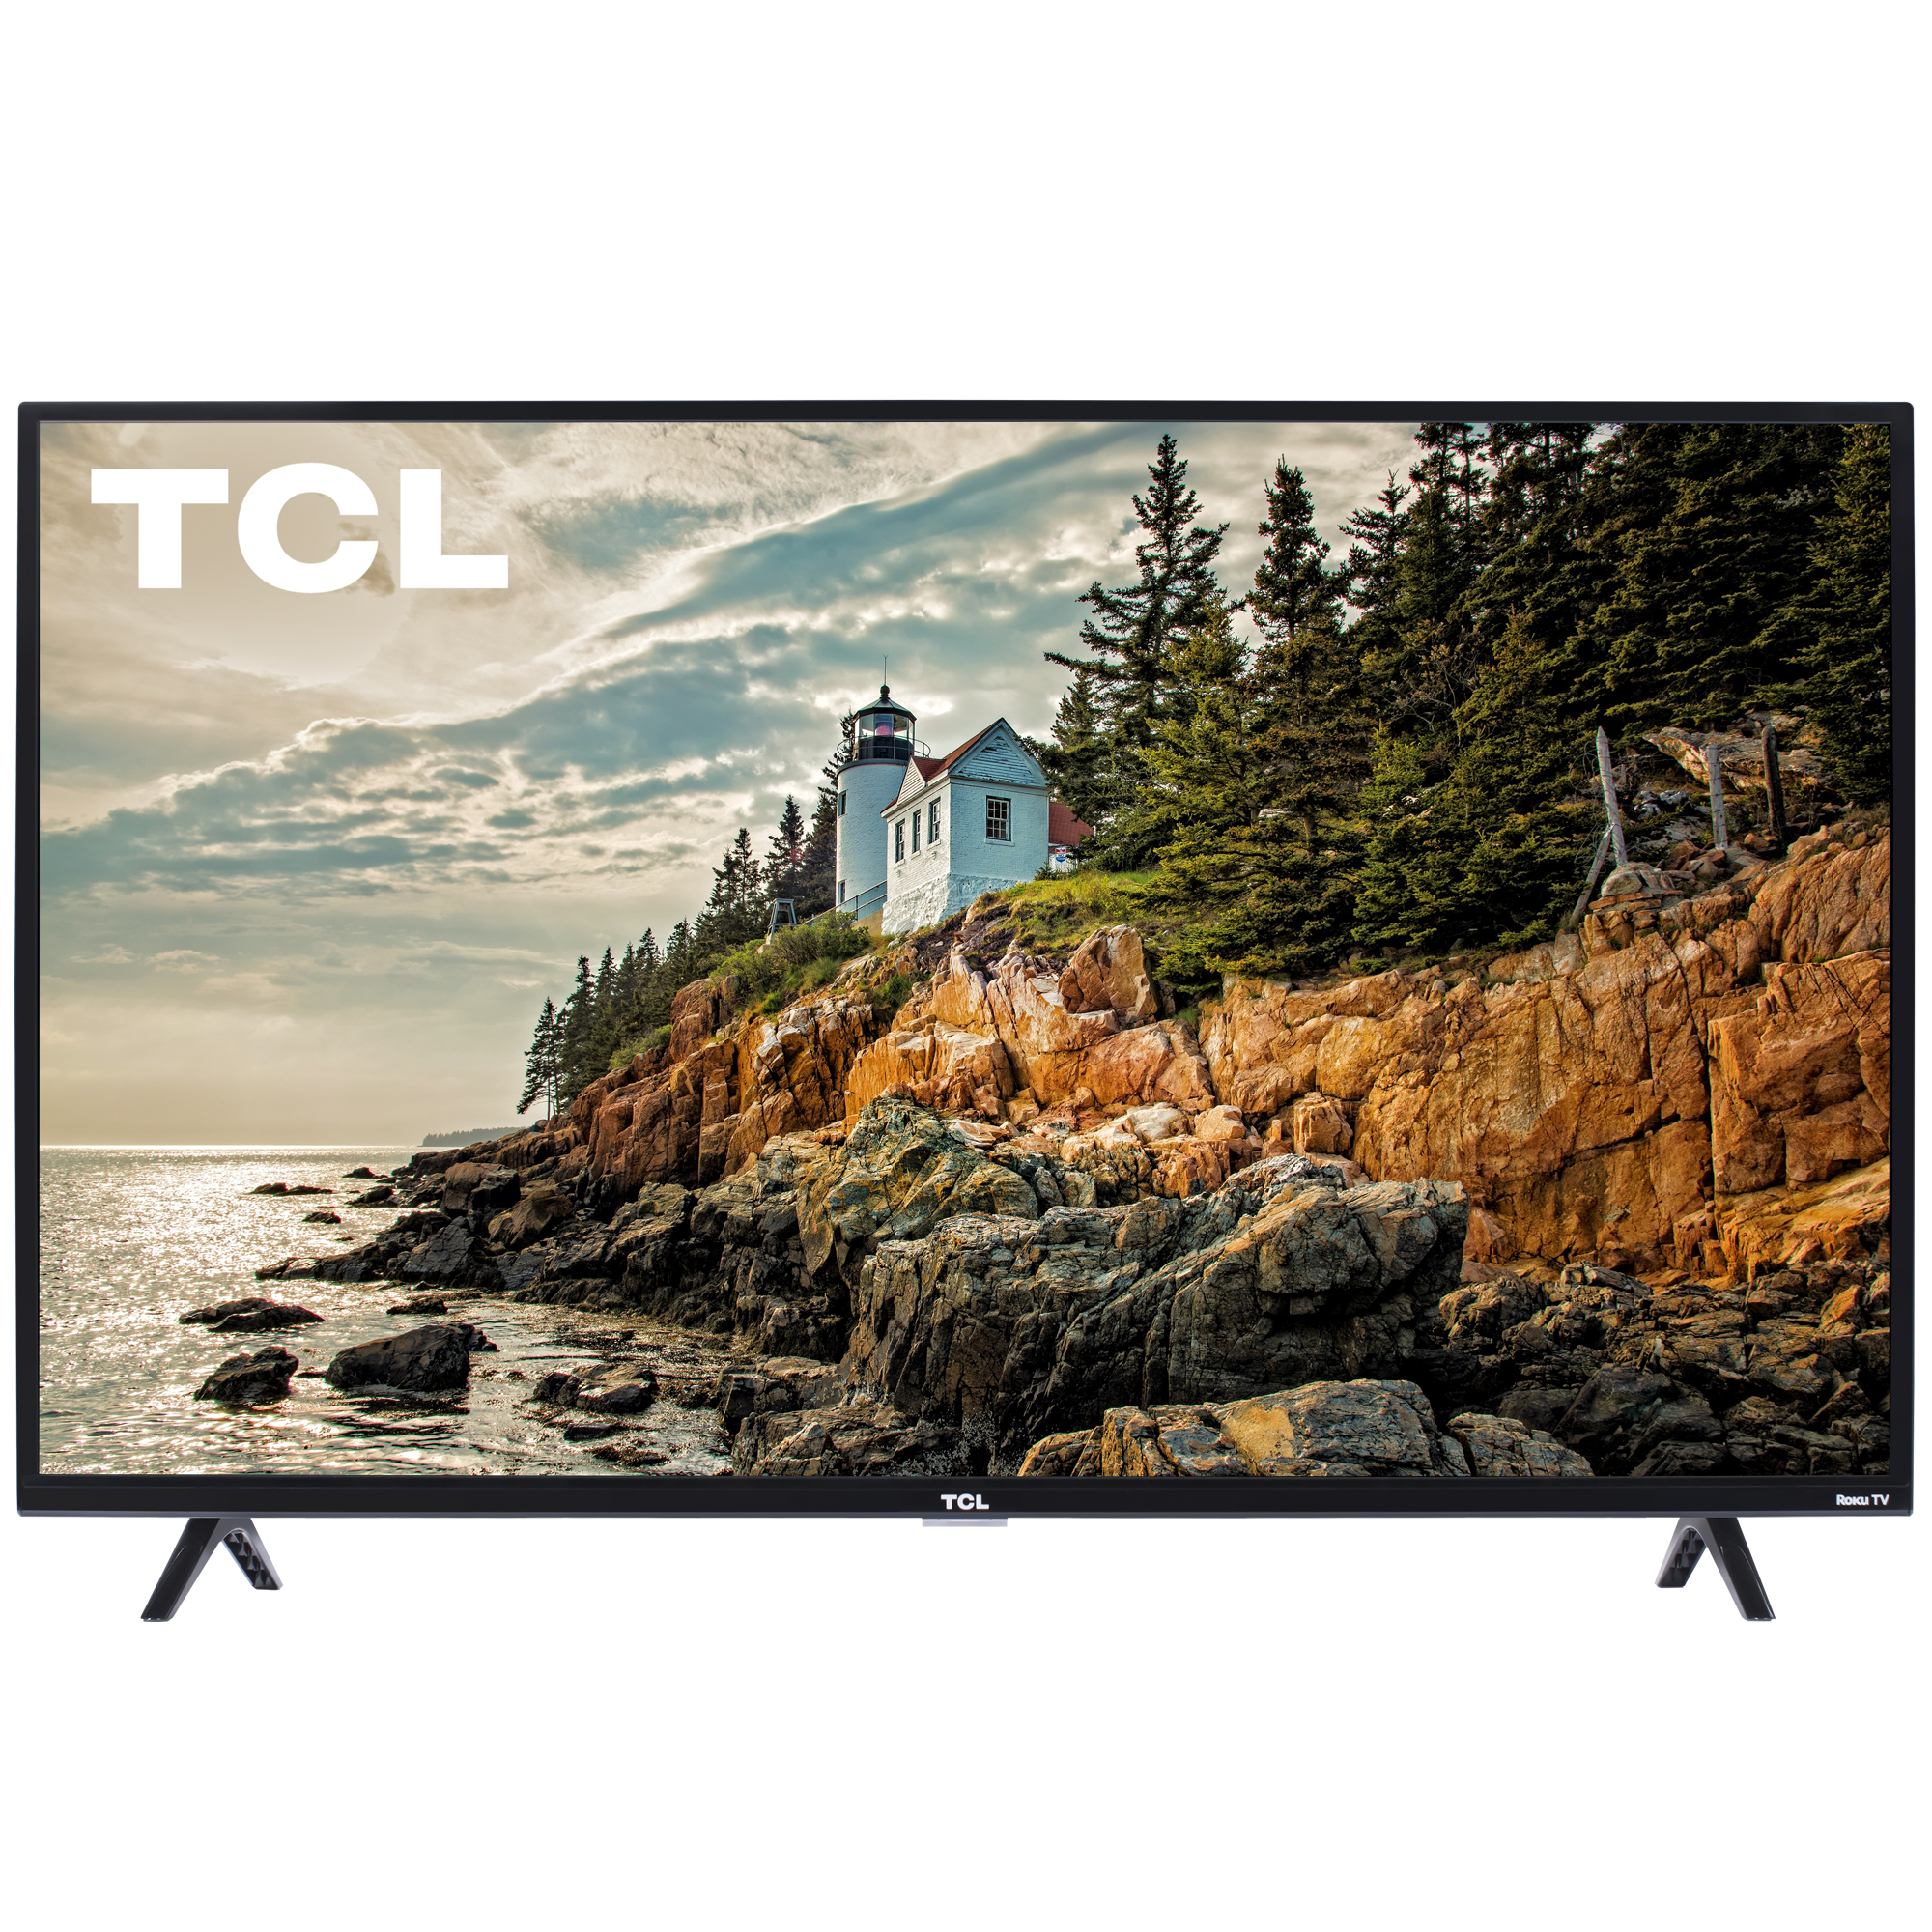 "TCL 43"" Class 4K UHD LED Roku Smart TV 4 Series 43S421"